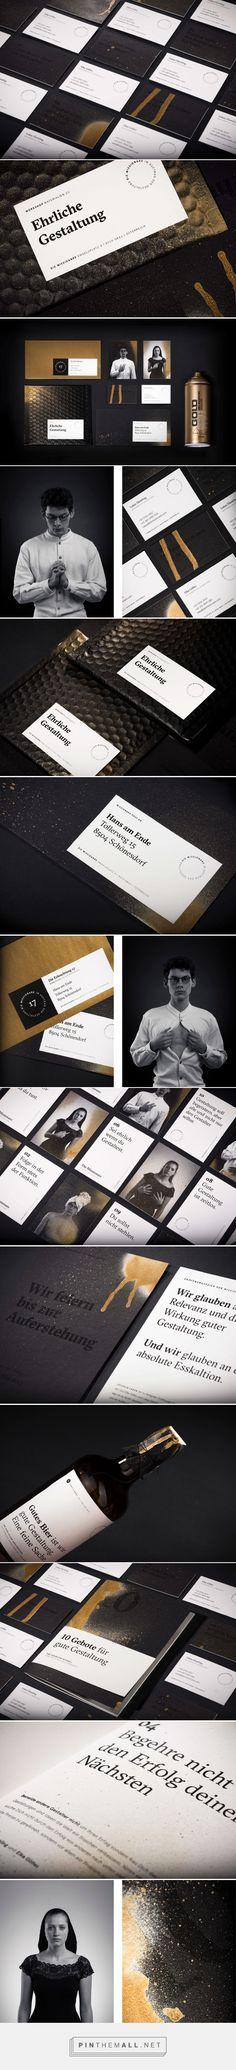 Die Missionare Creative Artist Branding by Lukas Diemling | Fivestar Branding Agency – Design and Branding Agency & Curated Inspiration Gallery